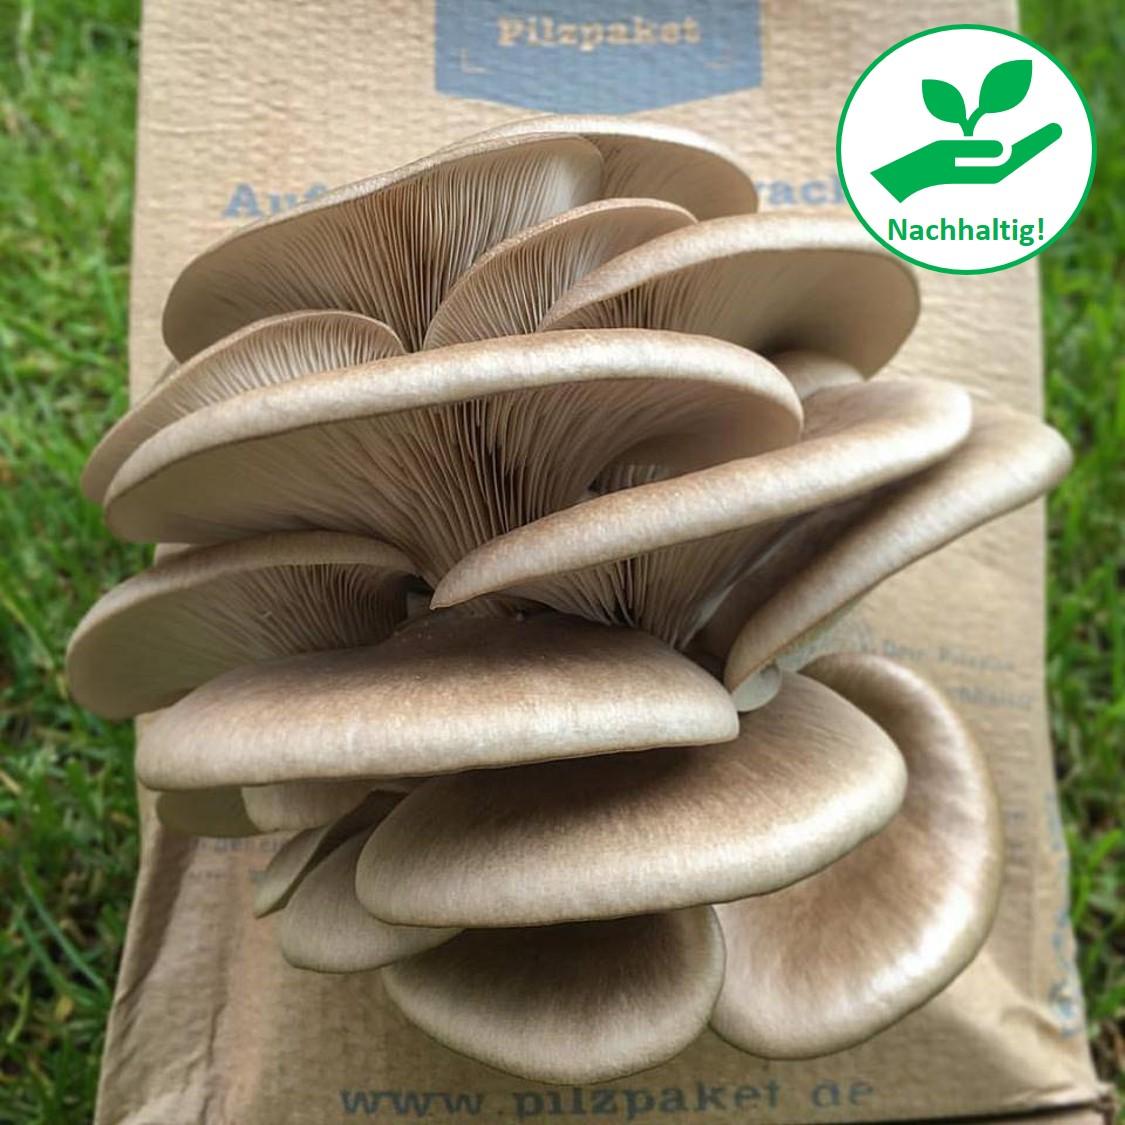 Florida Austern-Seitling aus Bayern! Pilze selbst züchten!